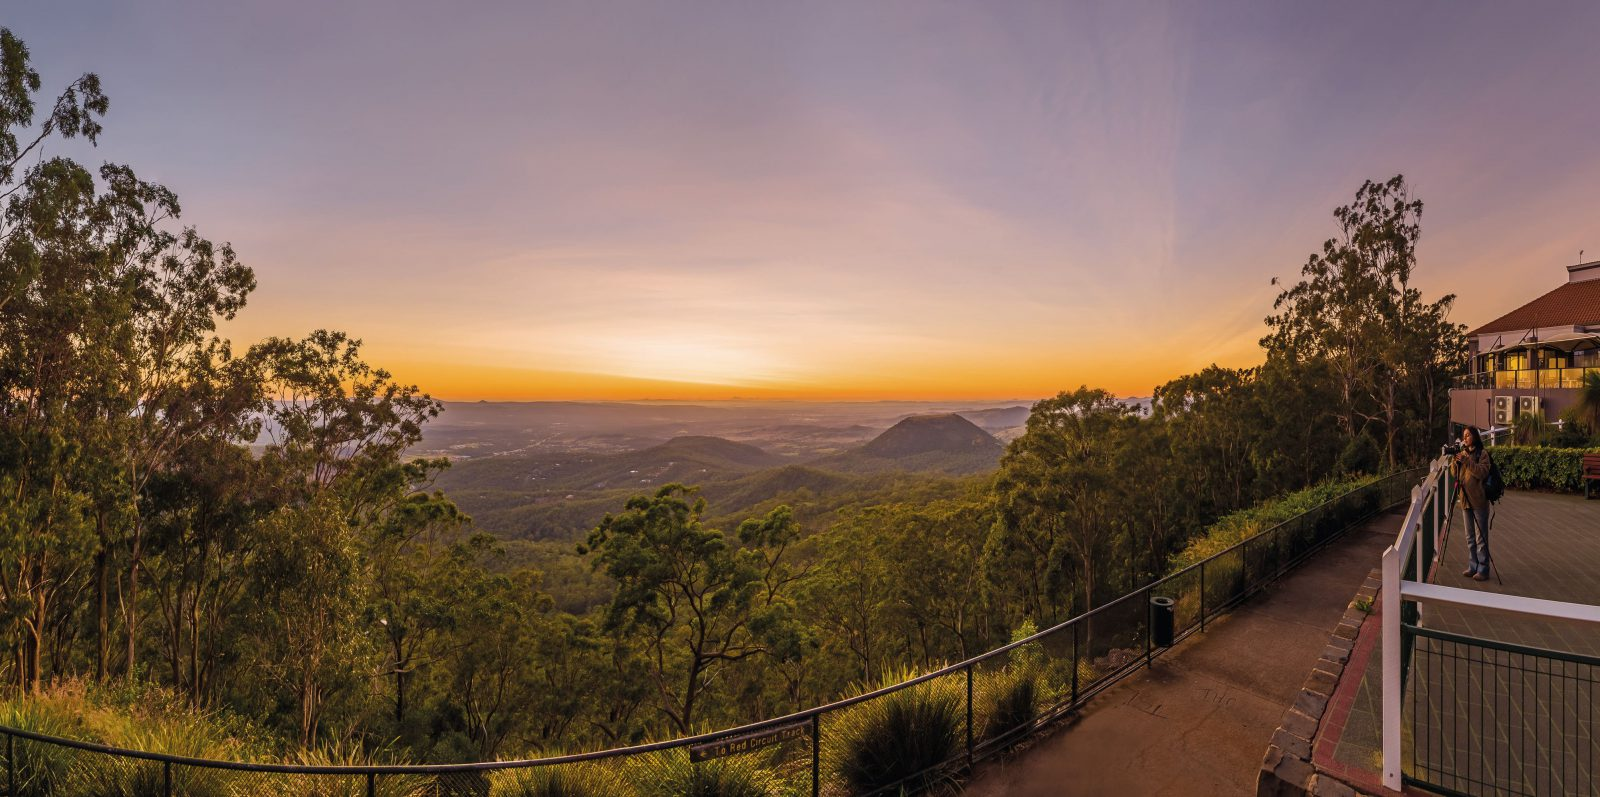 Solnedgång bland bergen i Queensland